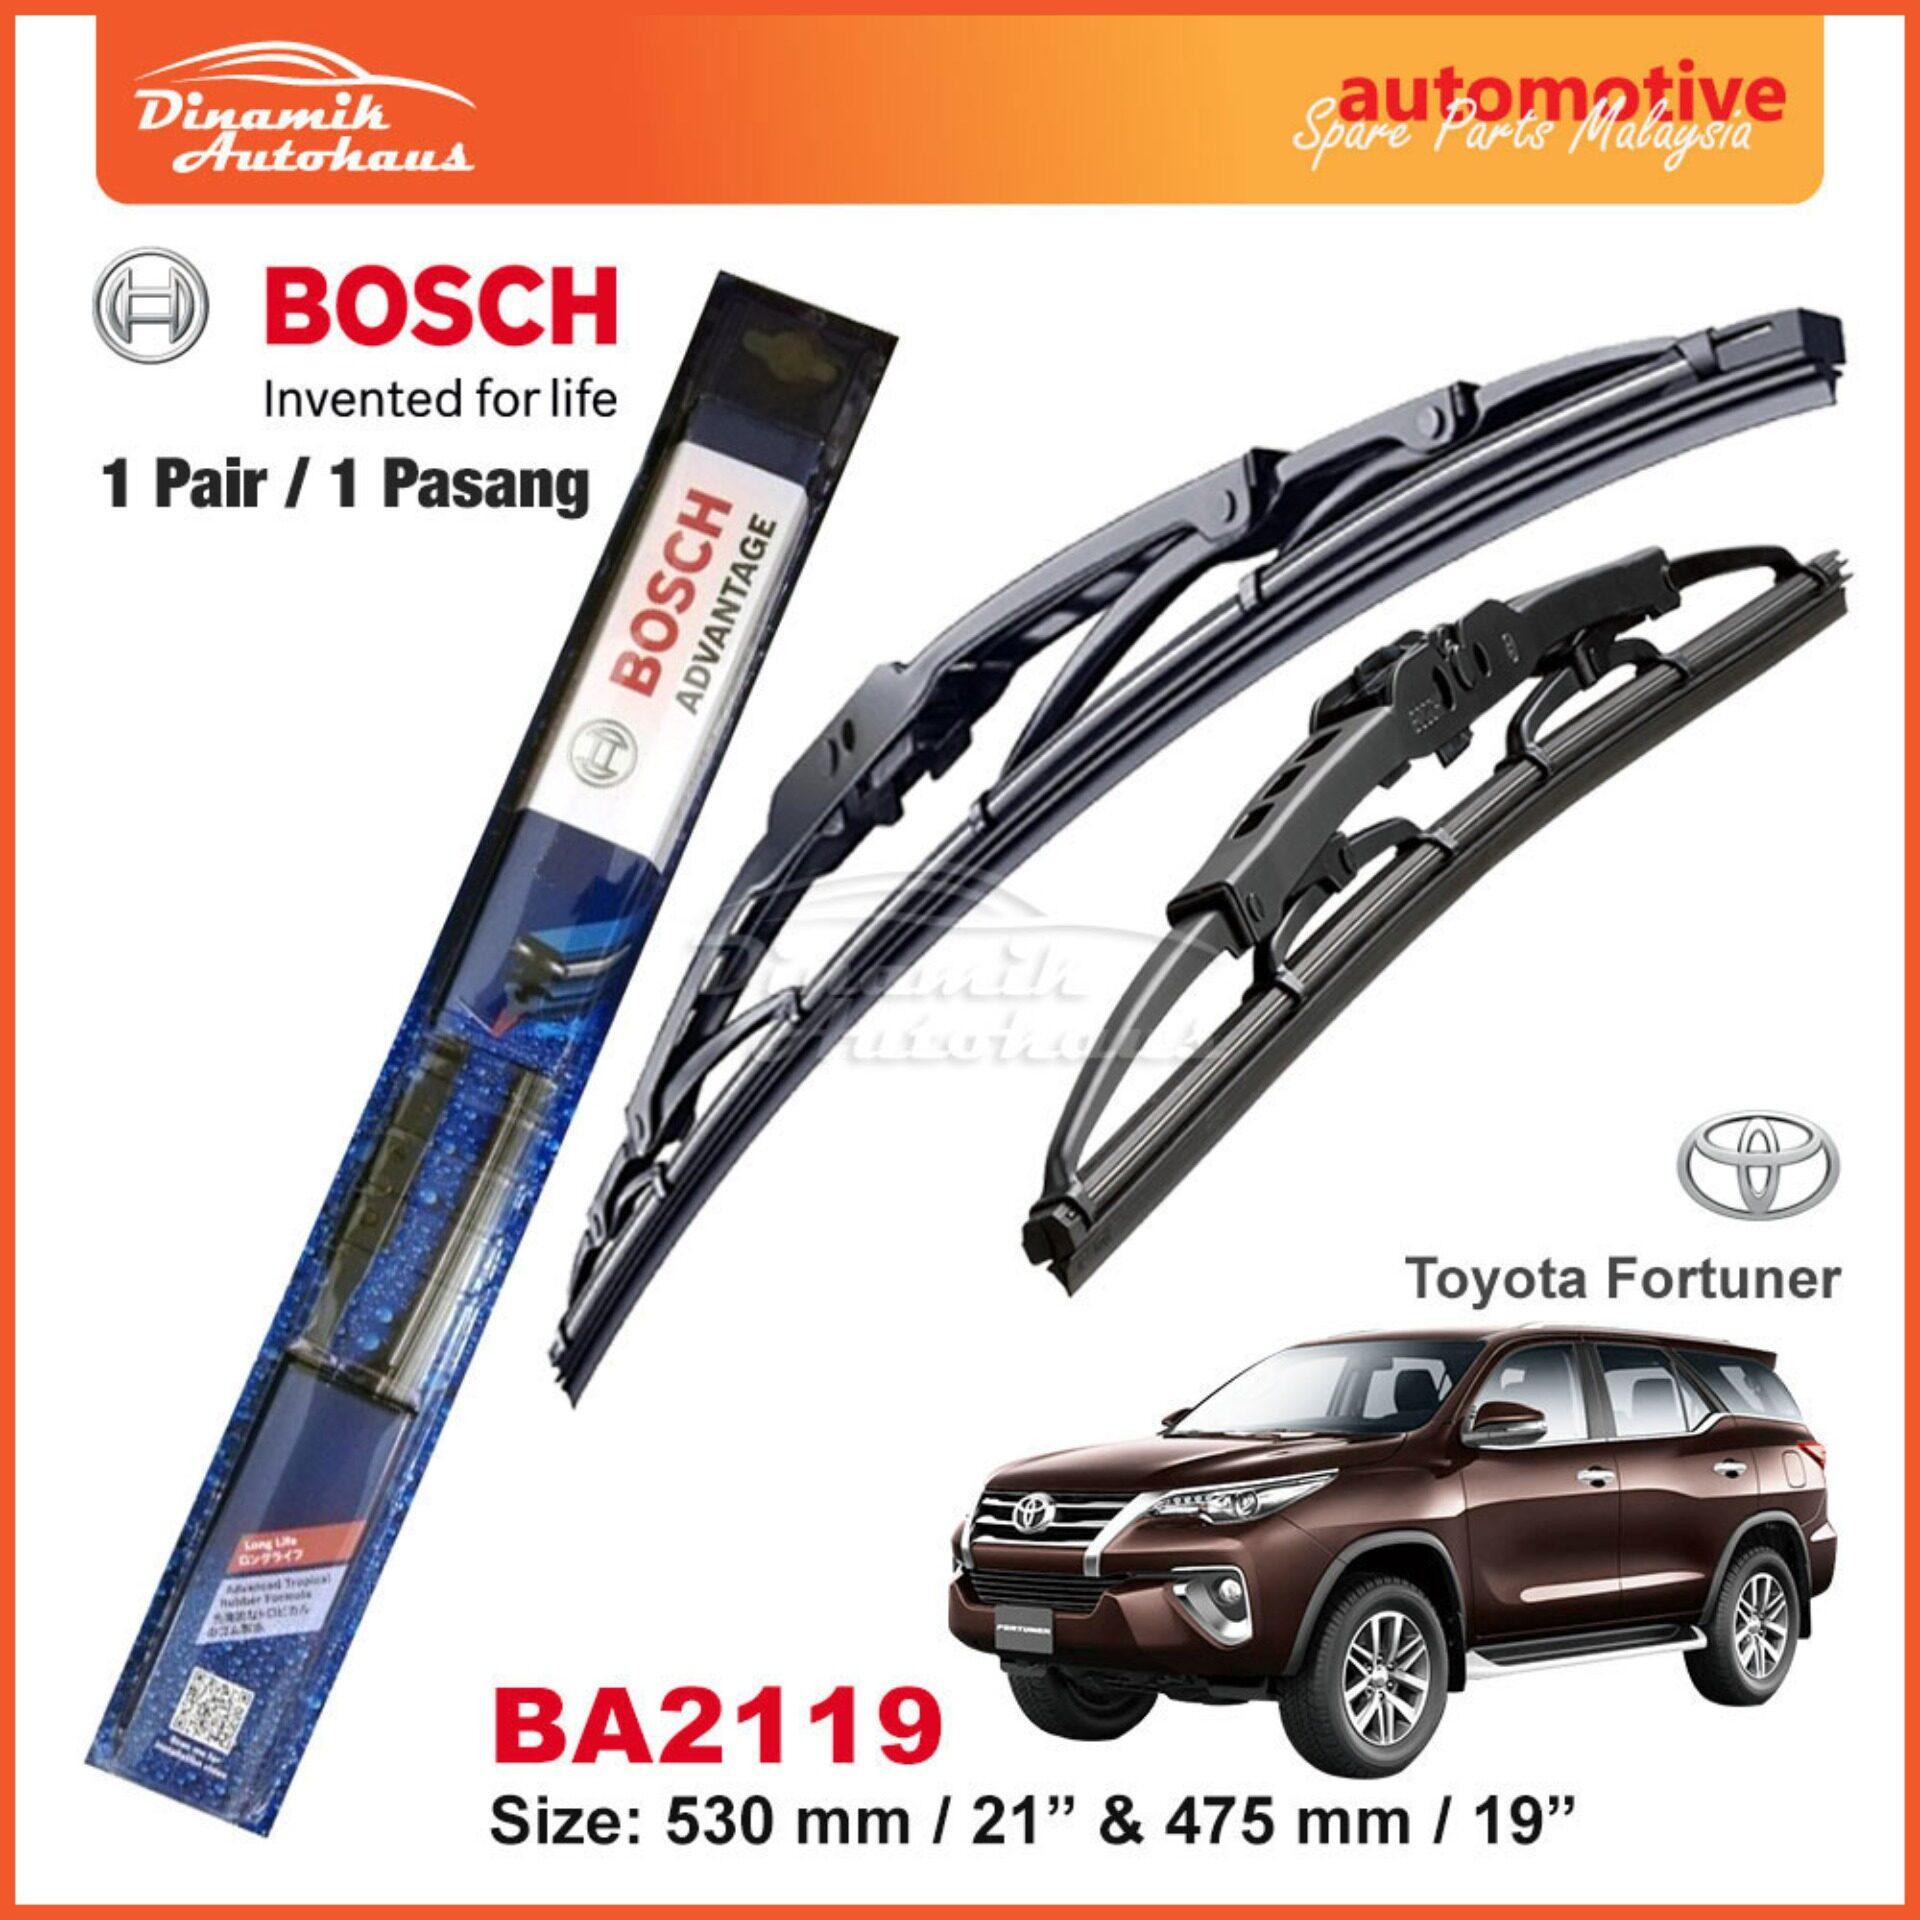 "Toyota Fortuner Car Windshield Wiper Blade 21"" / 19"" Bosch Advantage BA2119"